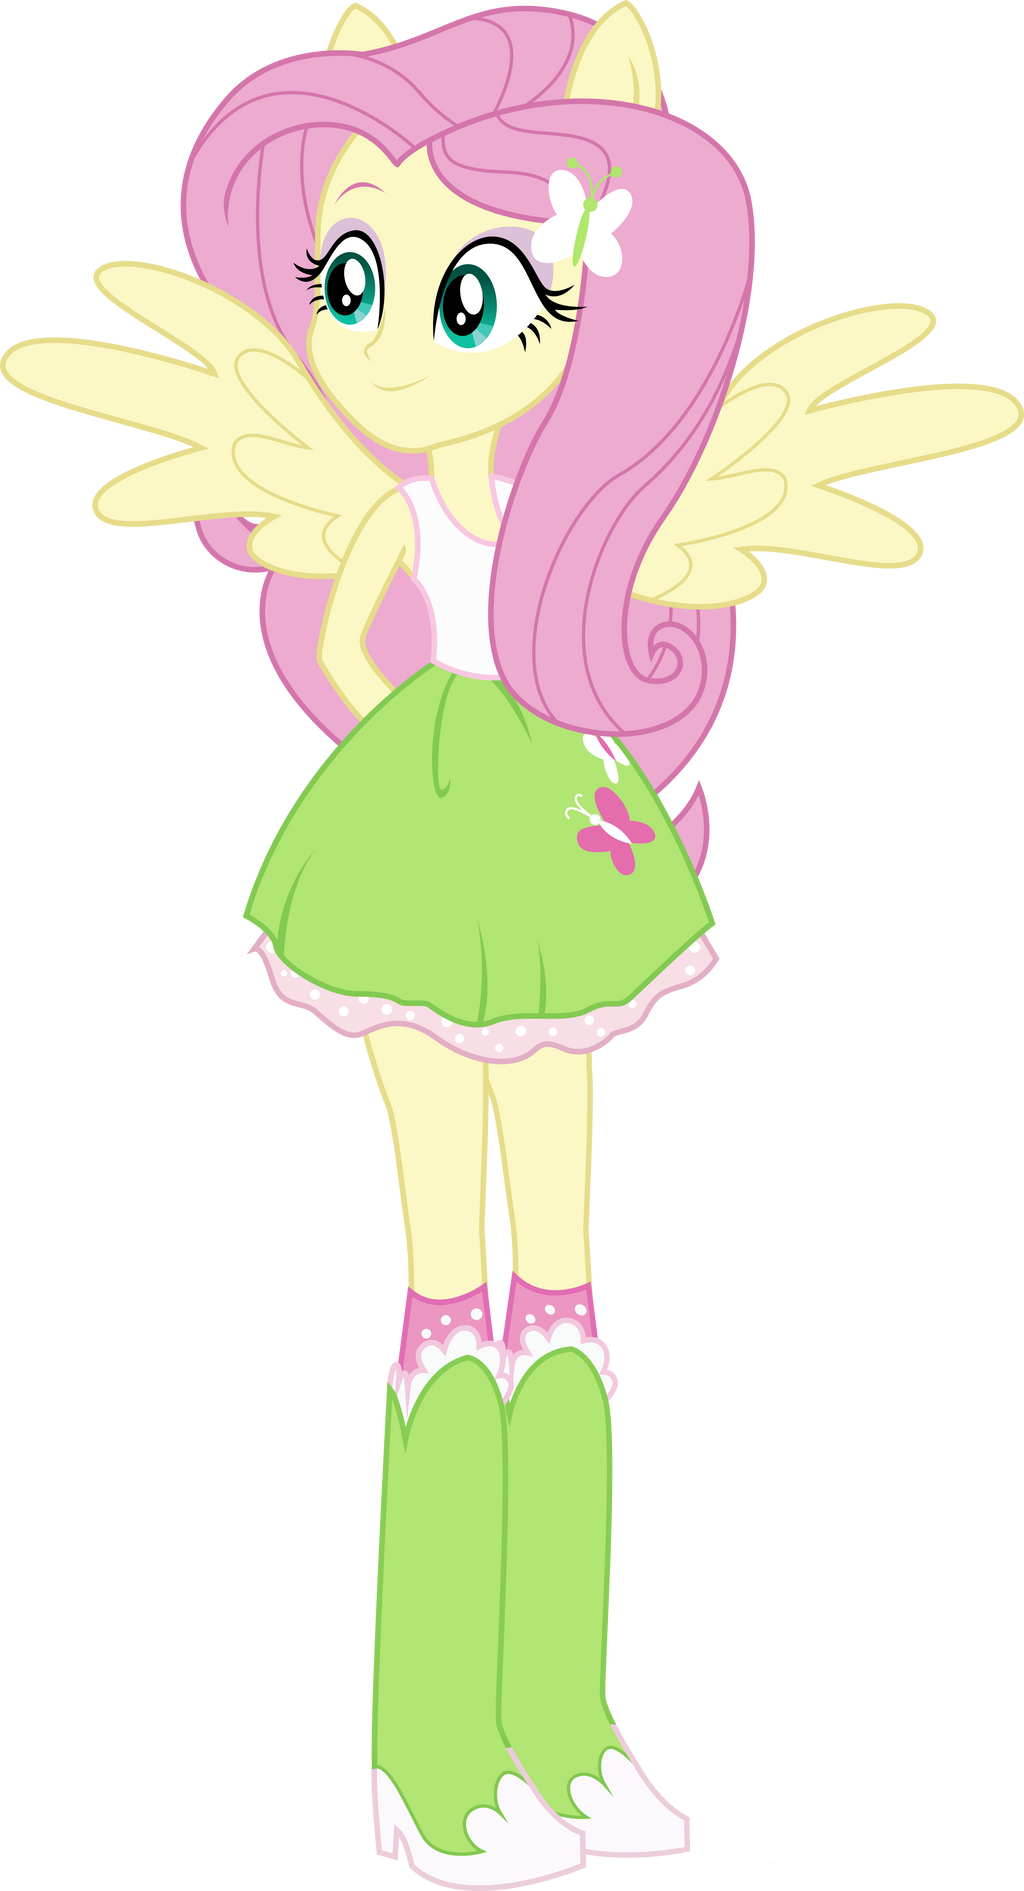 fluttershy equestria girl